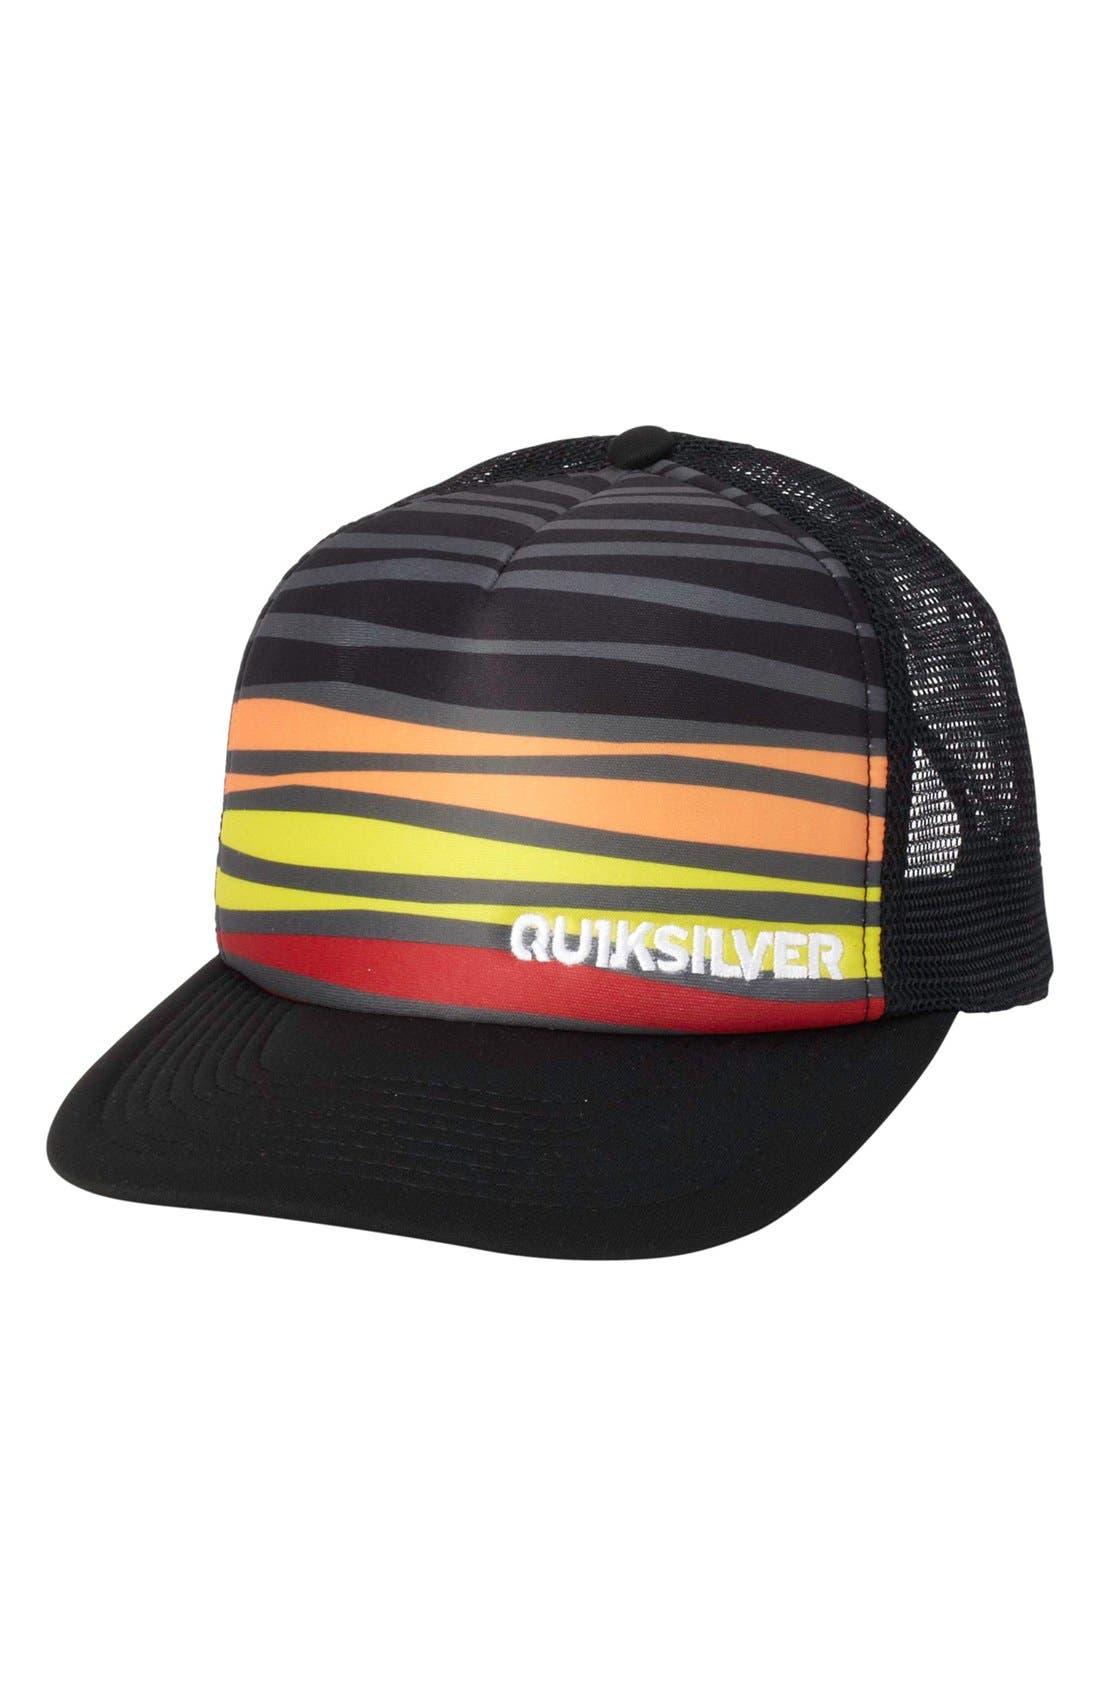 Alternate Image 1 Selected - Quiksilver 'Boards' Trucker Hat (Big Boys)